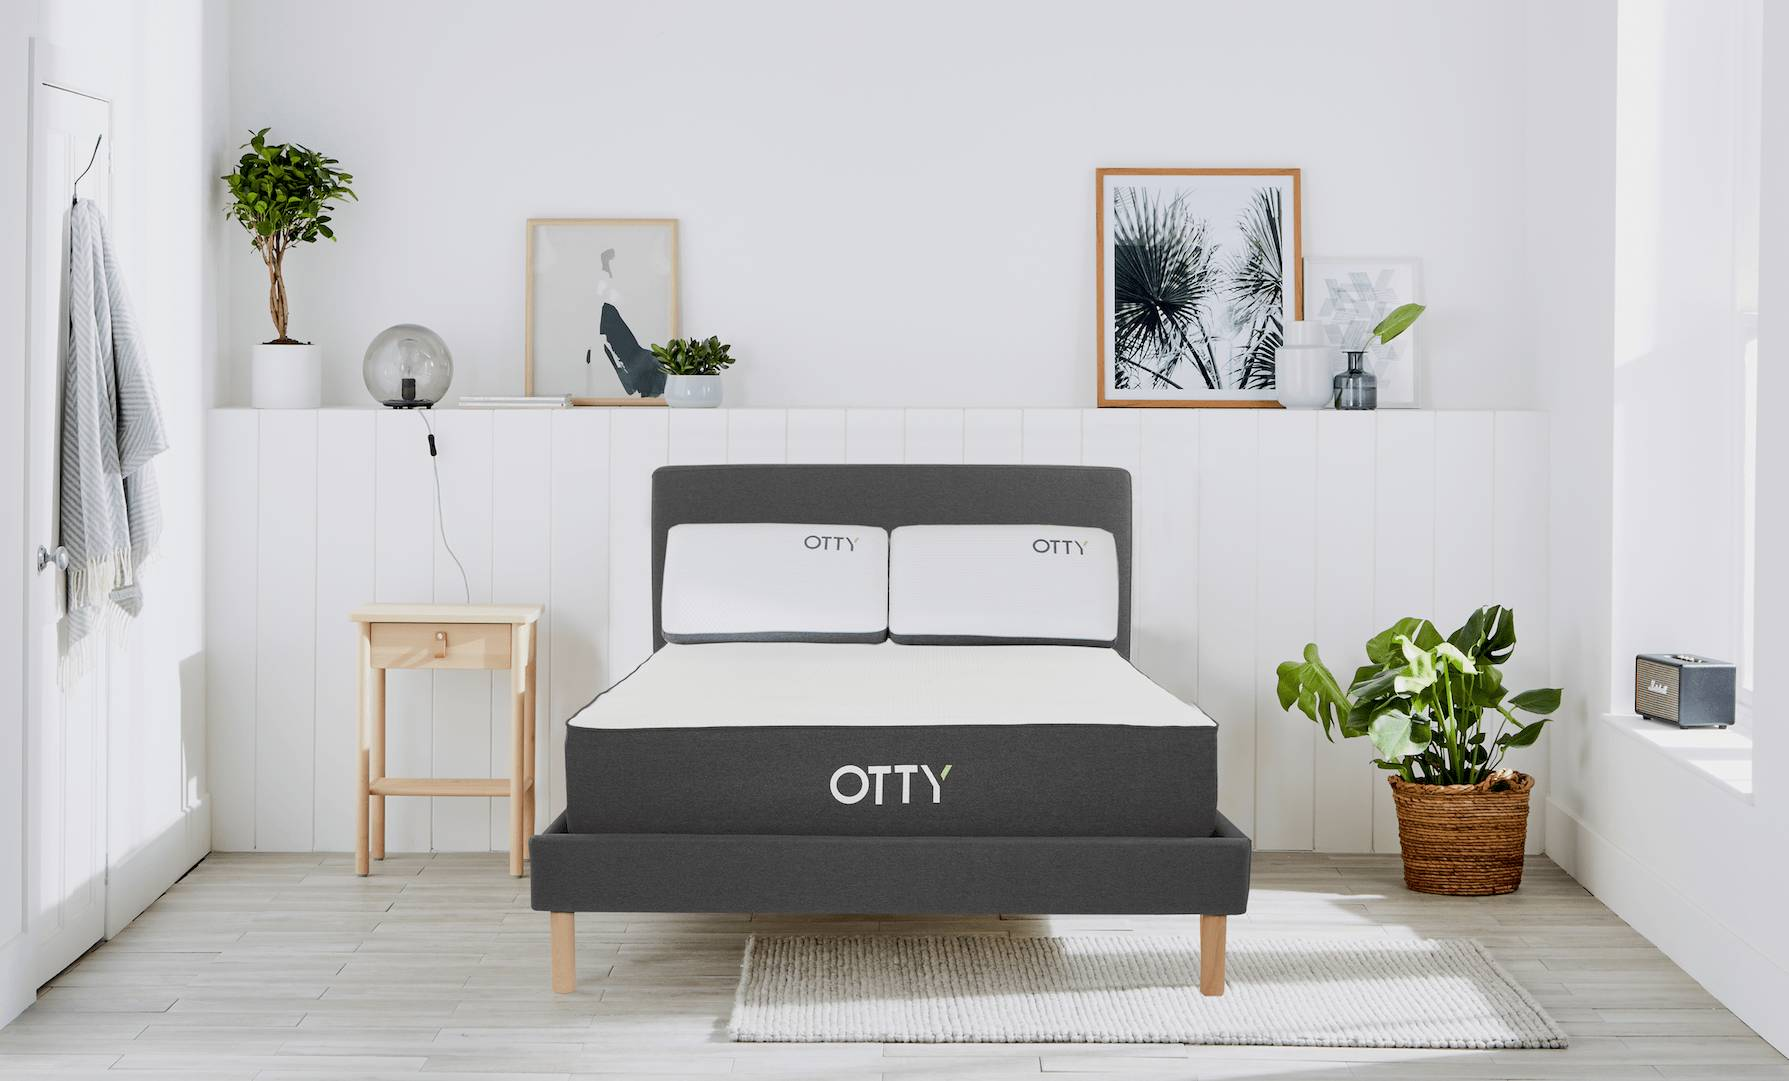 OTTY Sleep OTTY Hybrid Mattress, Bed Frame & Deluxe Pillows, Double   W135 L190 H25 cm